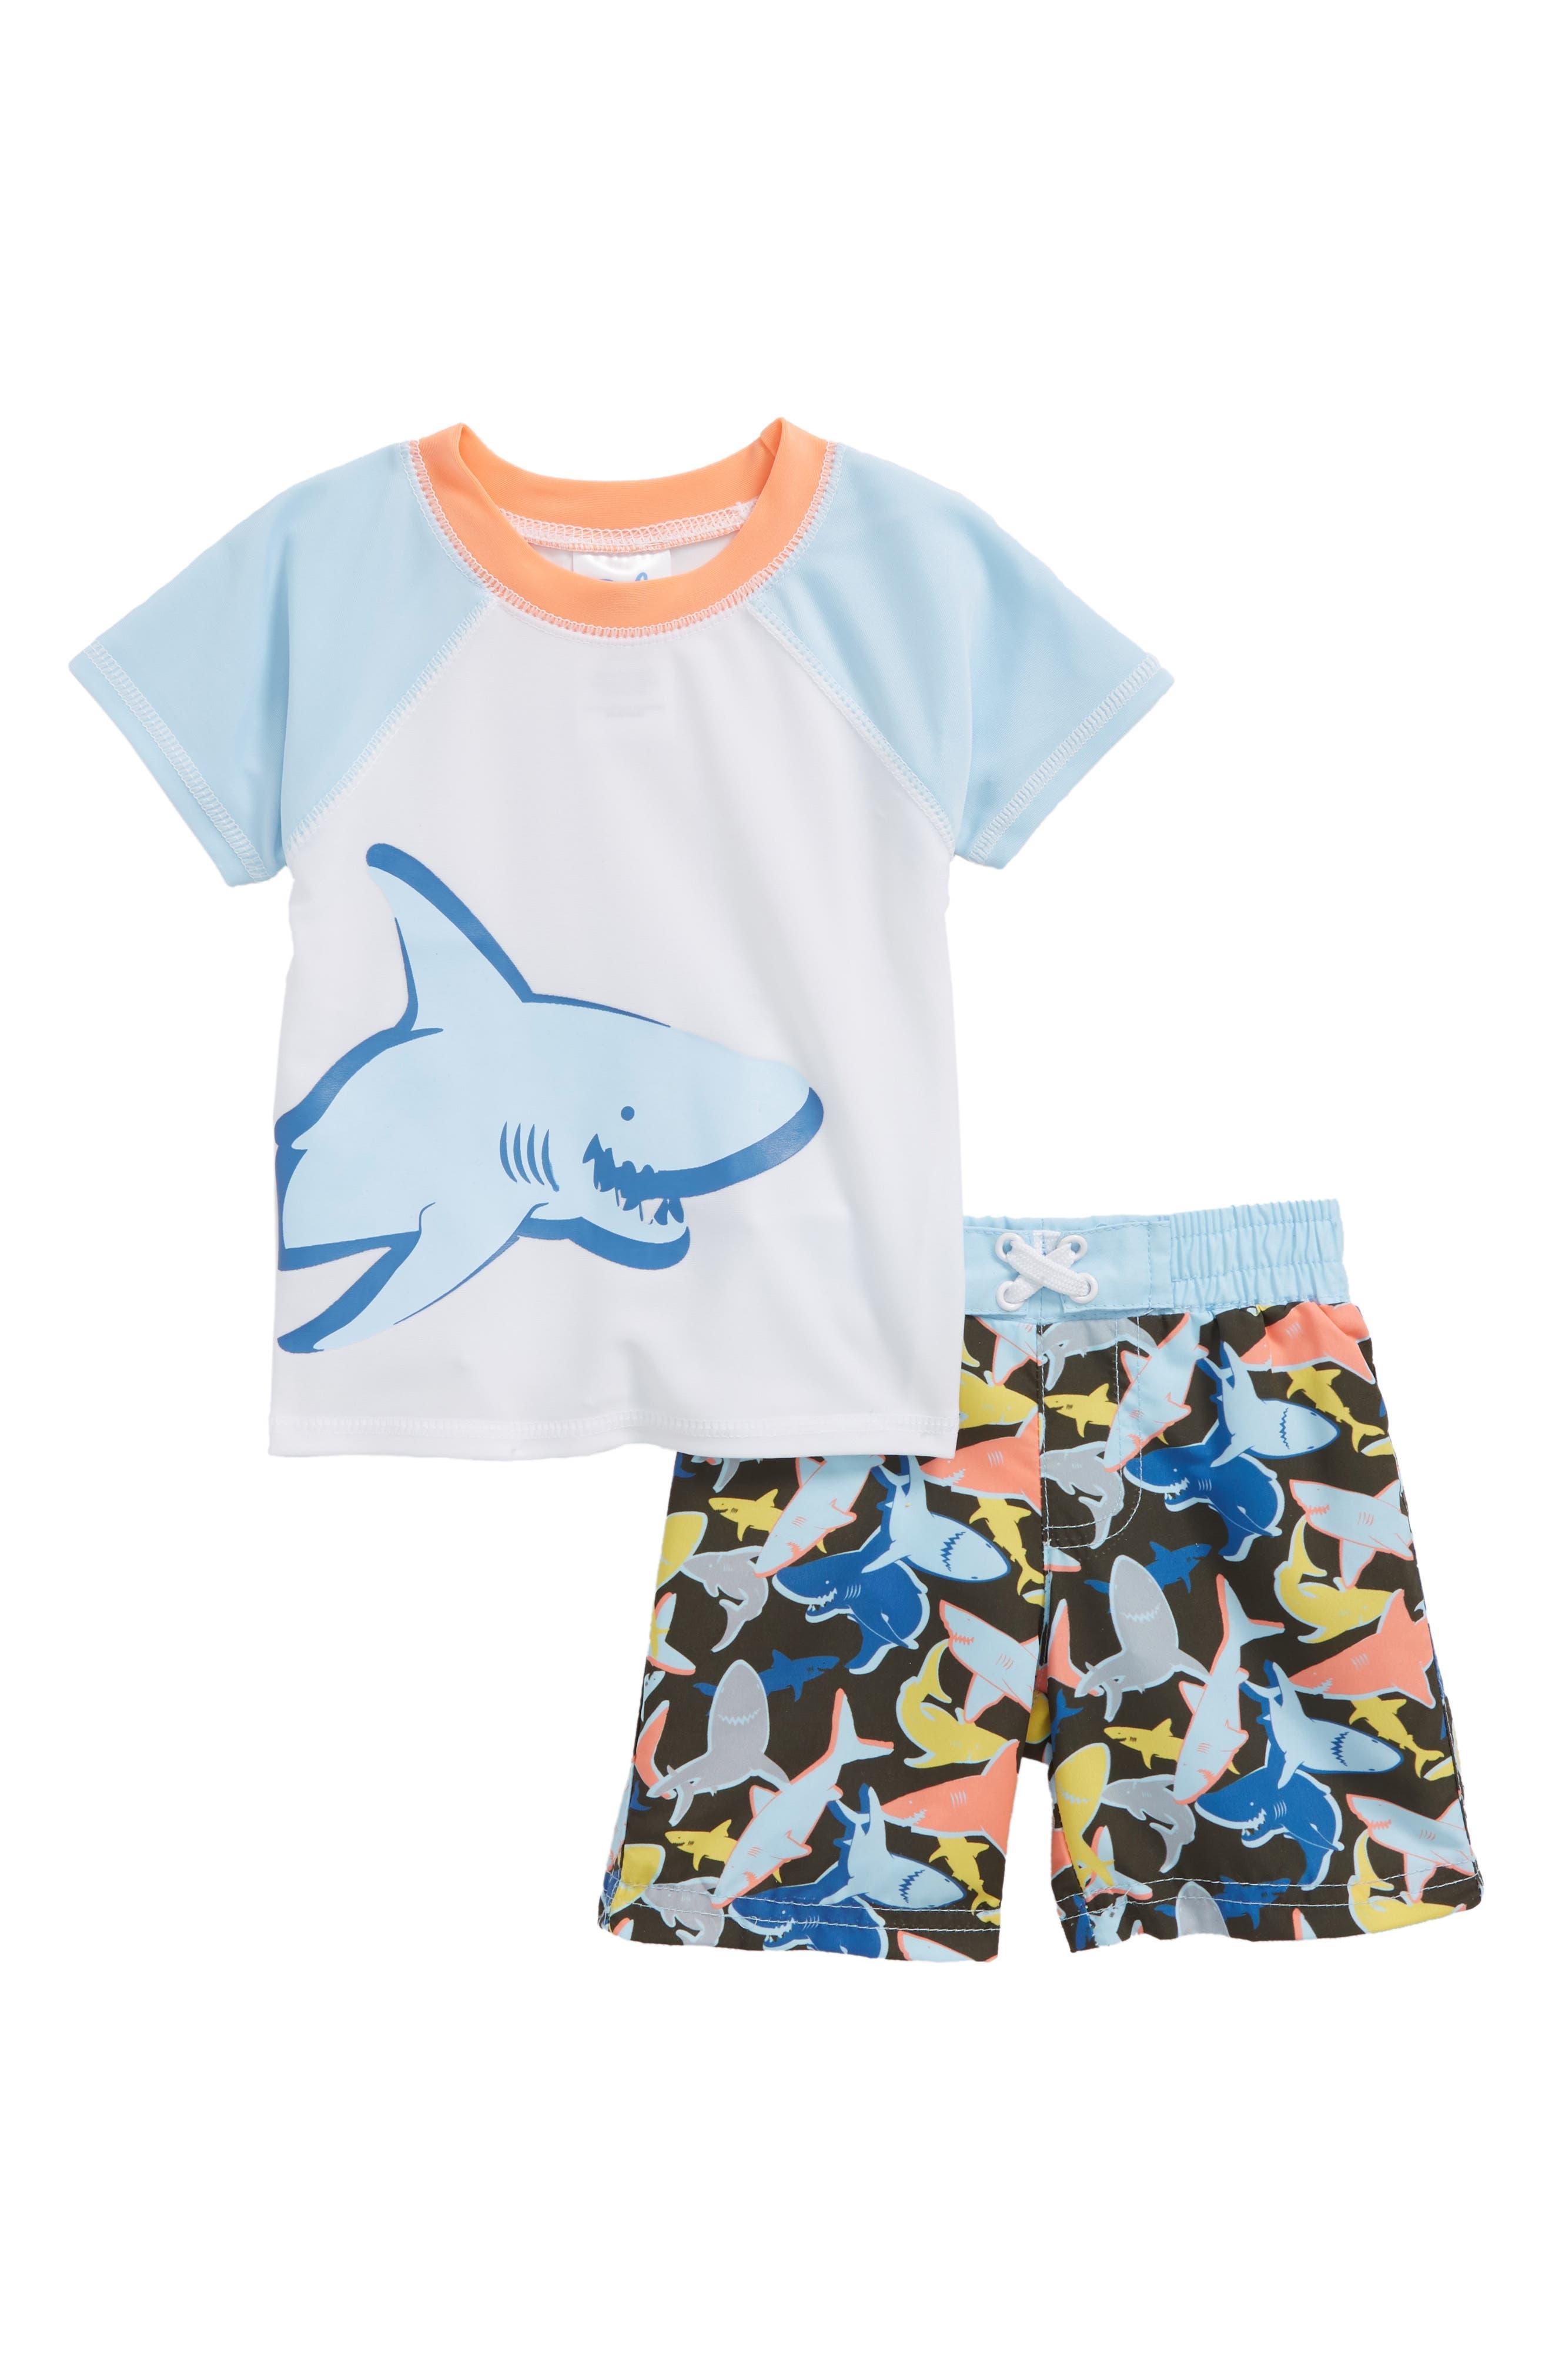 Friendly Shark Collison Two-Piece Rashguard Swimsuit,                             Main thumbnail 1, color,                             109